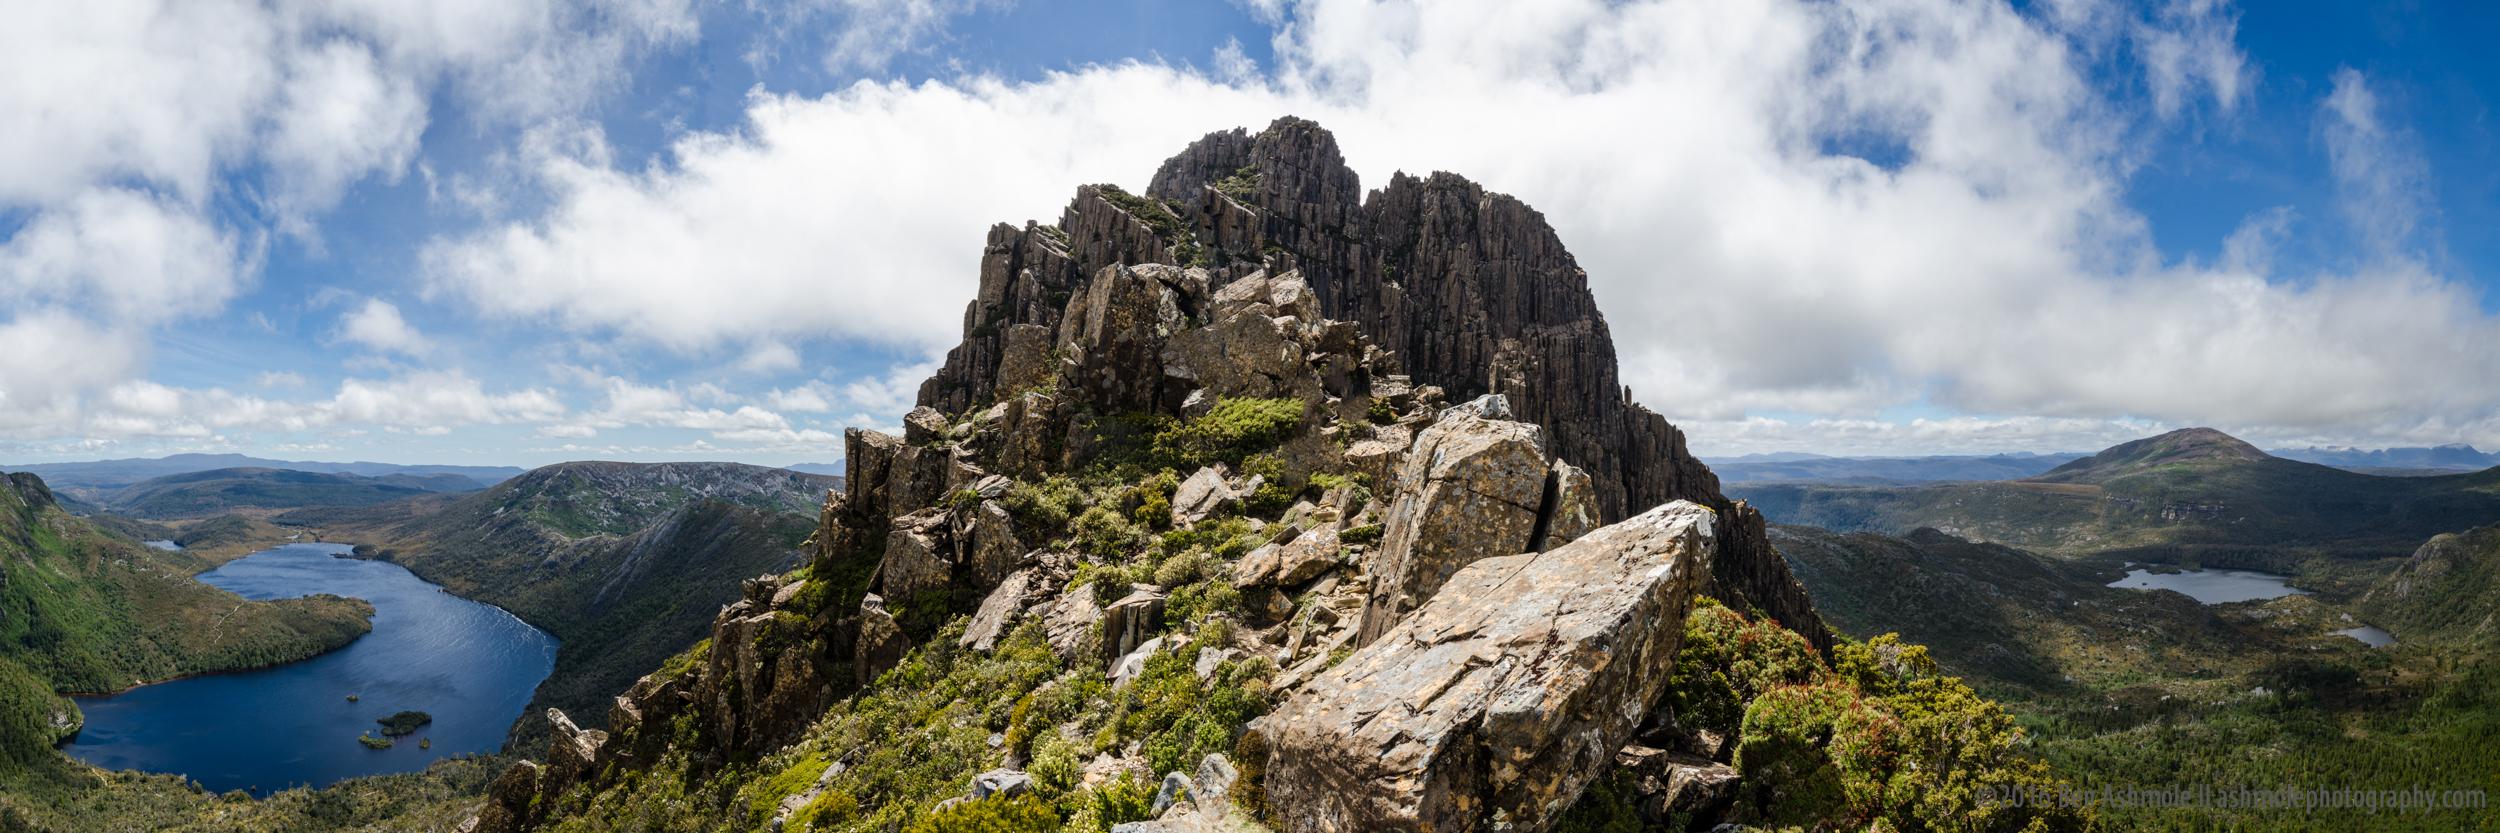 Cradle Mountain Peak Panorama, Tasmania, Australia